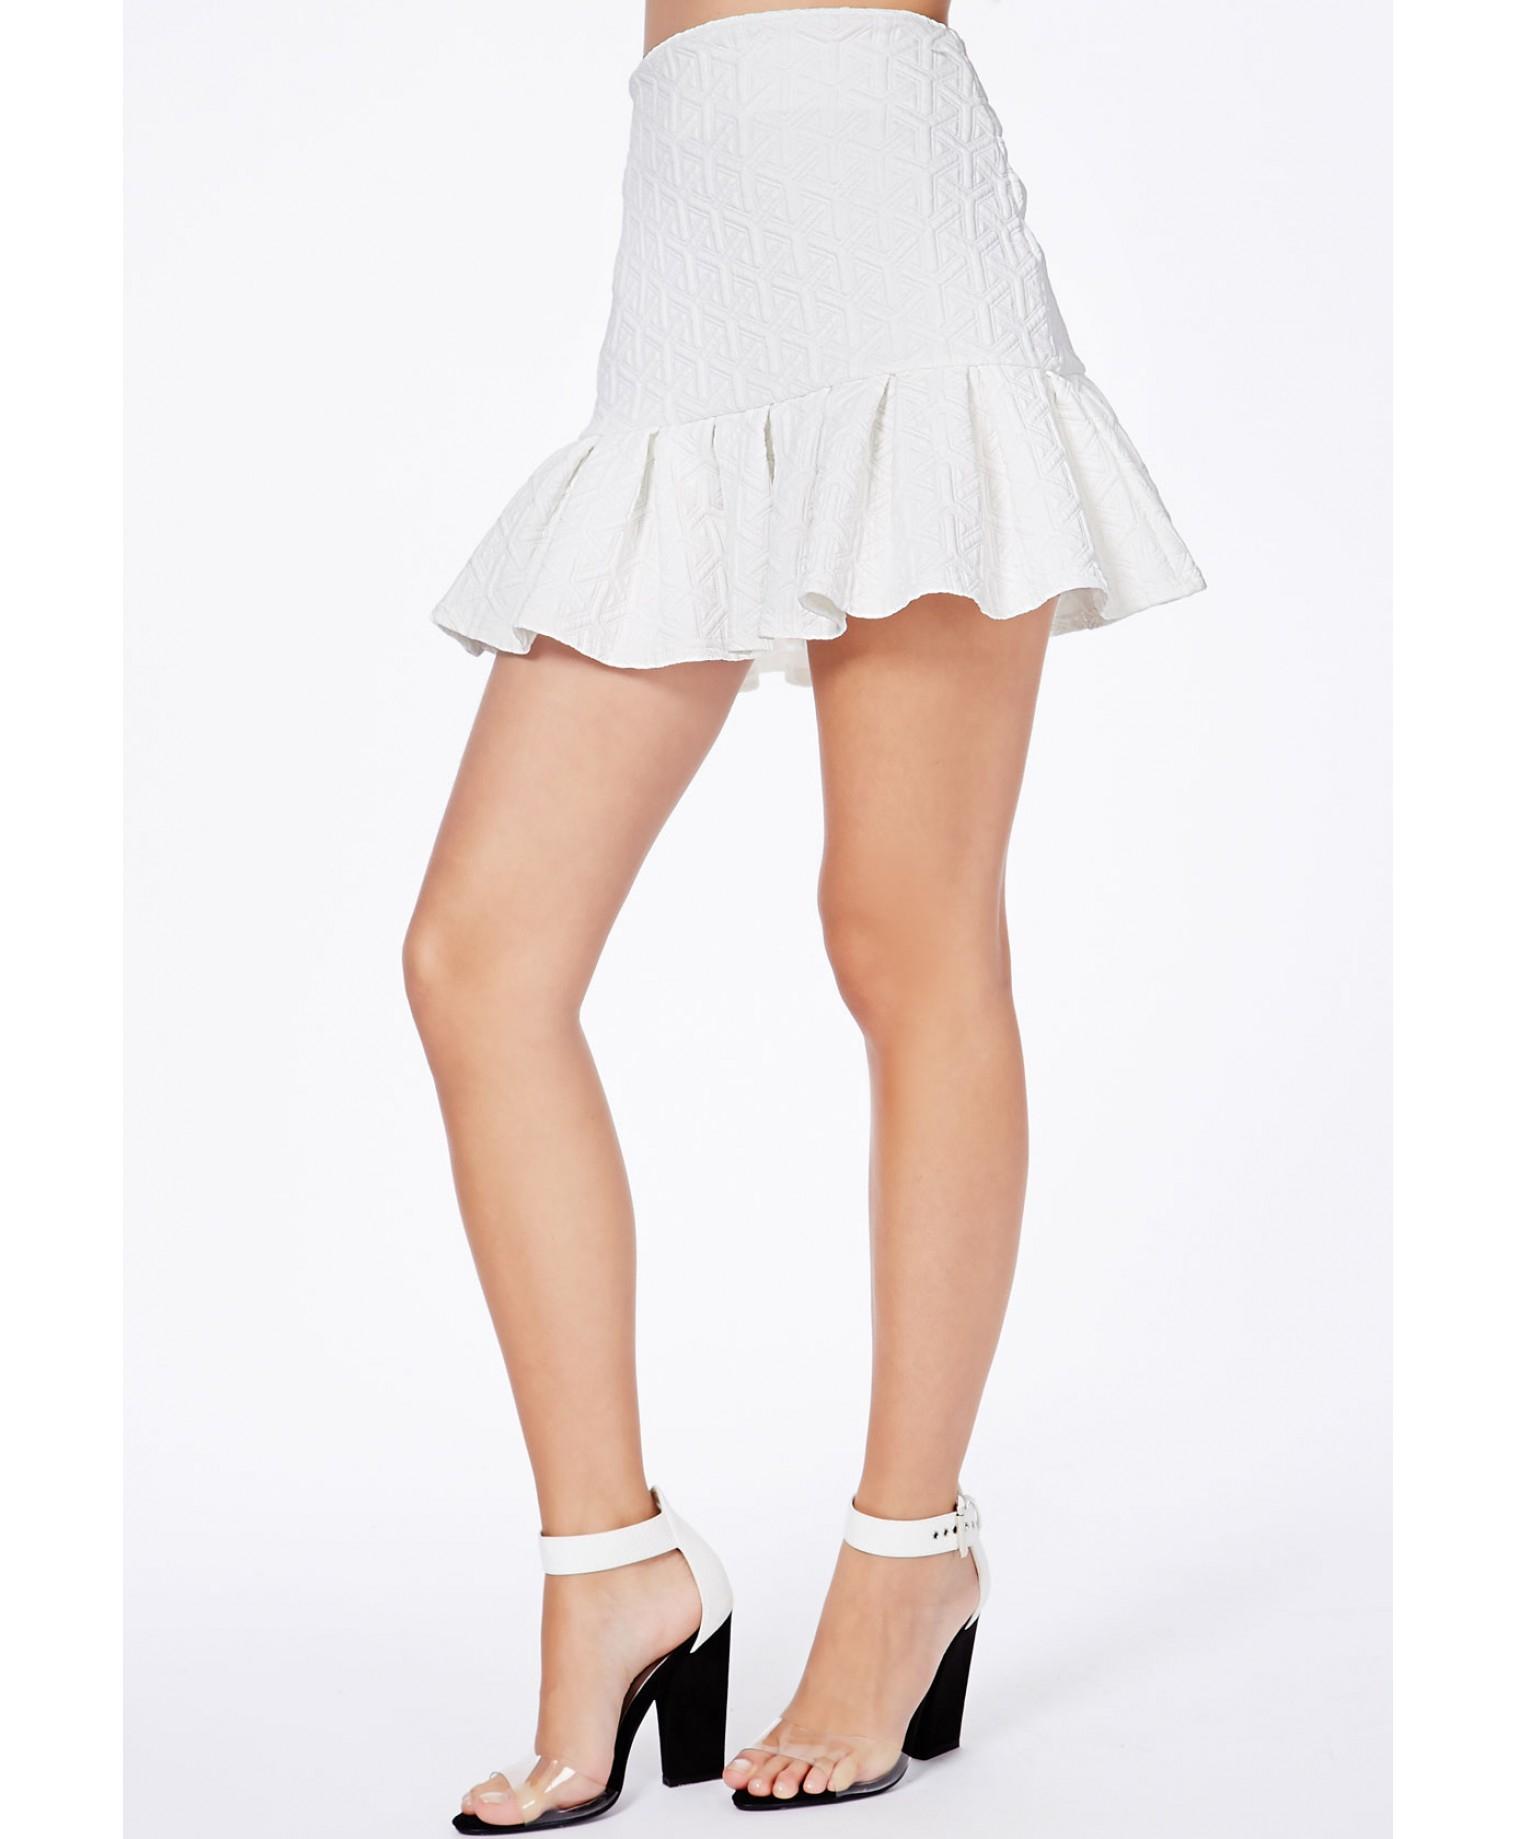 Missguided Mattie White Textured Pleated Mini Skirt in White   Lyst